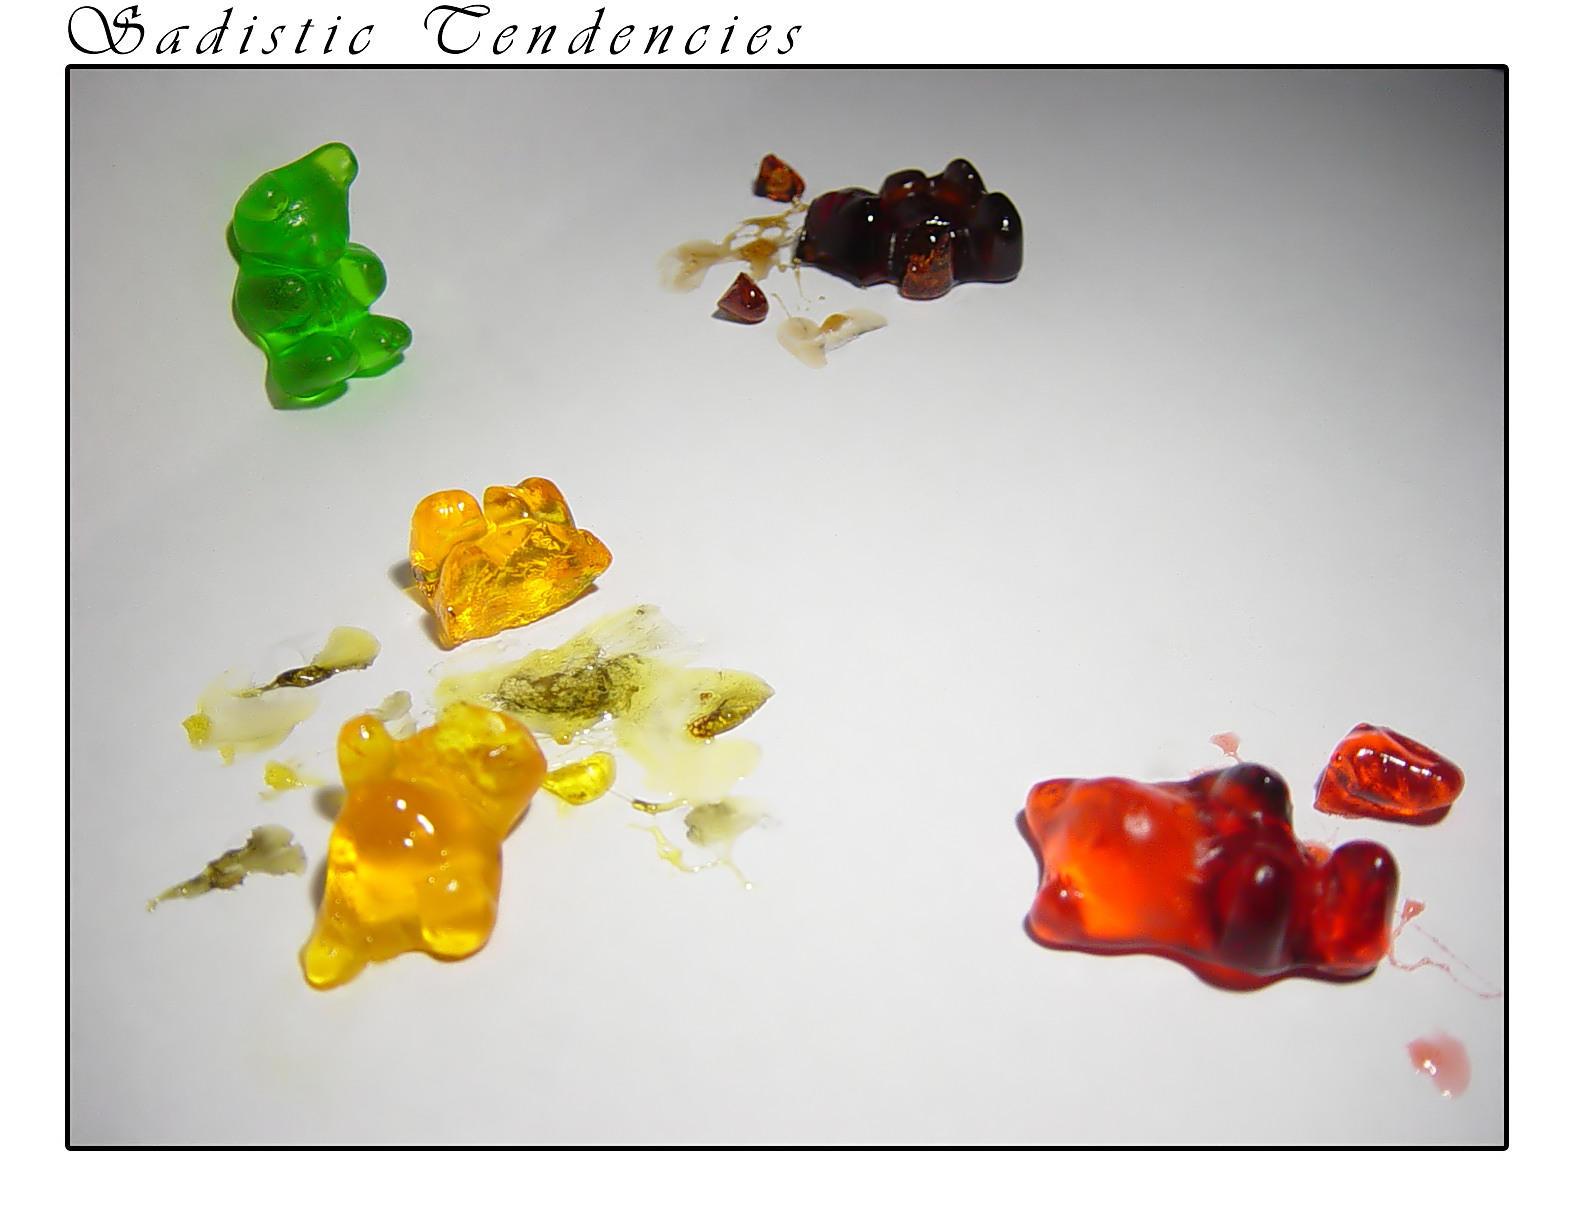 Sadistic Tendencies by Doomith